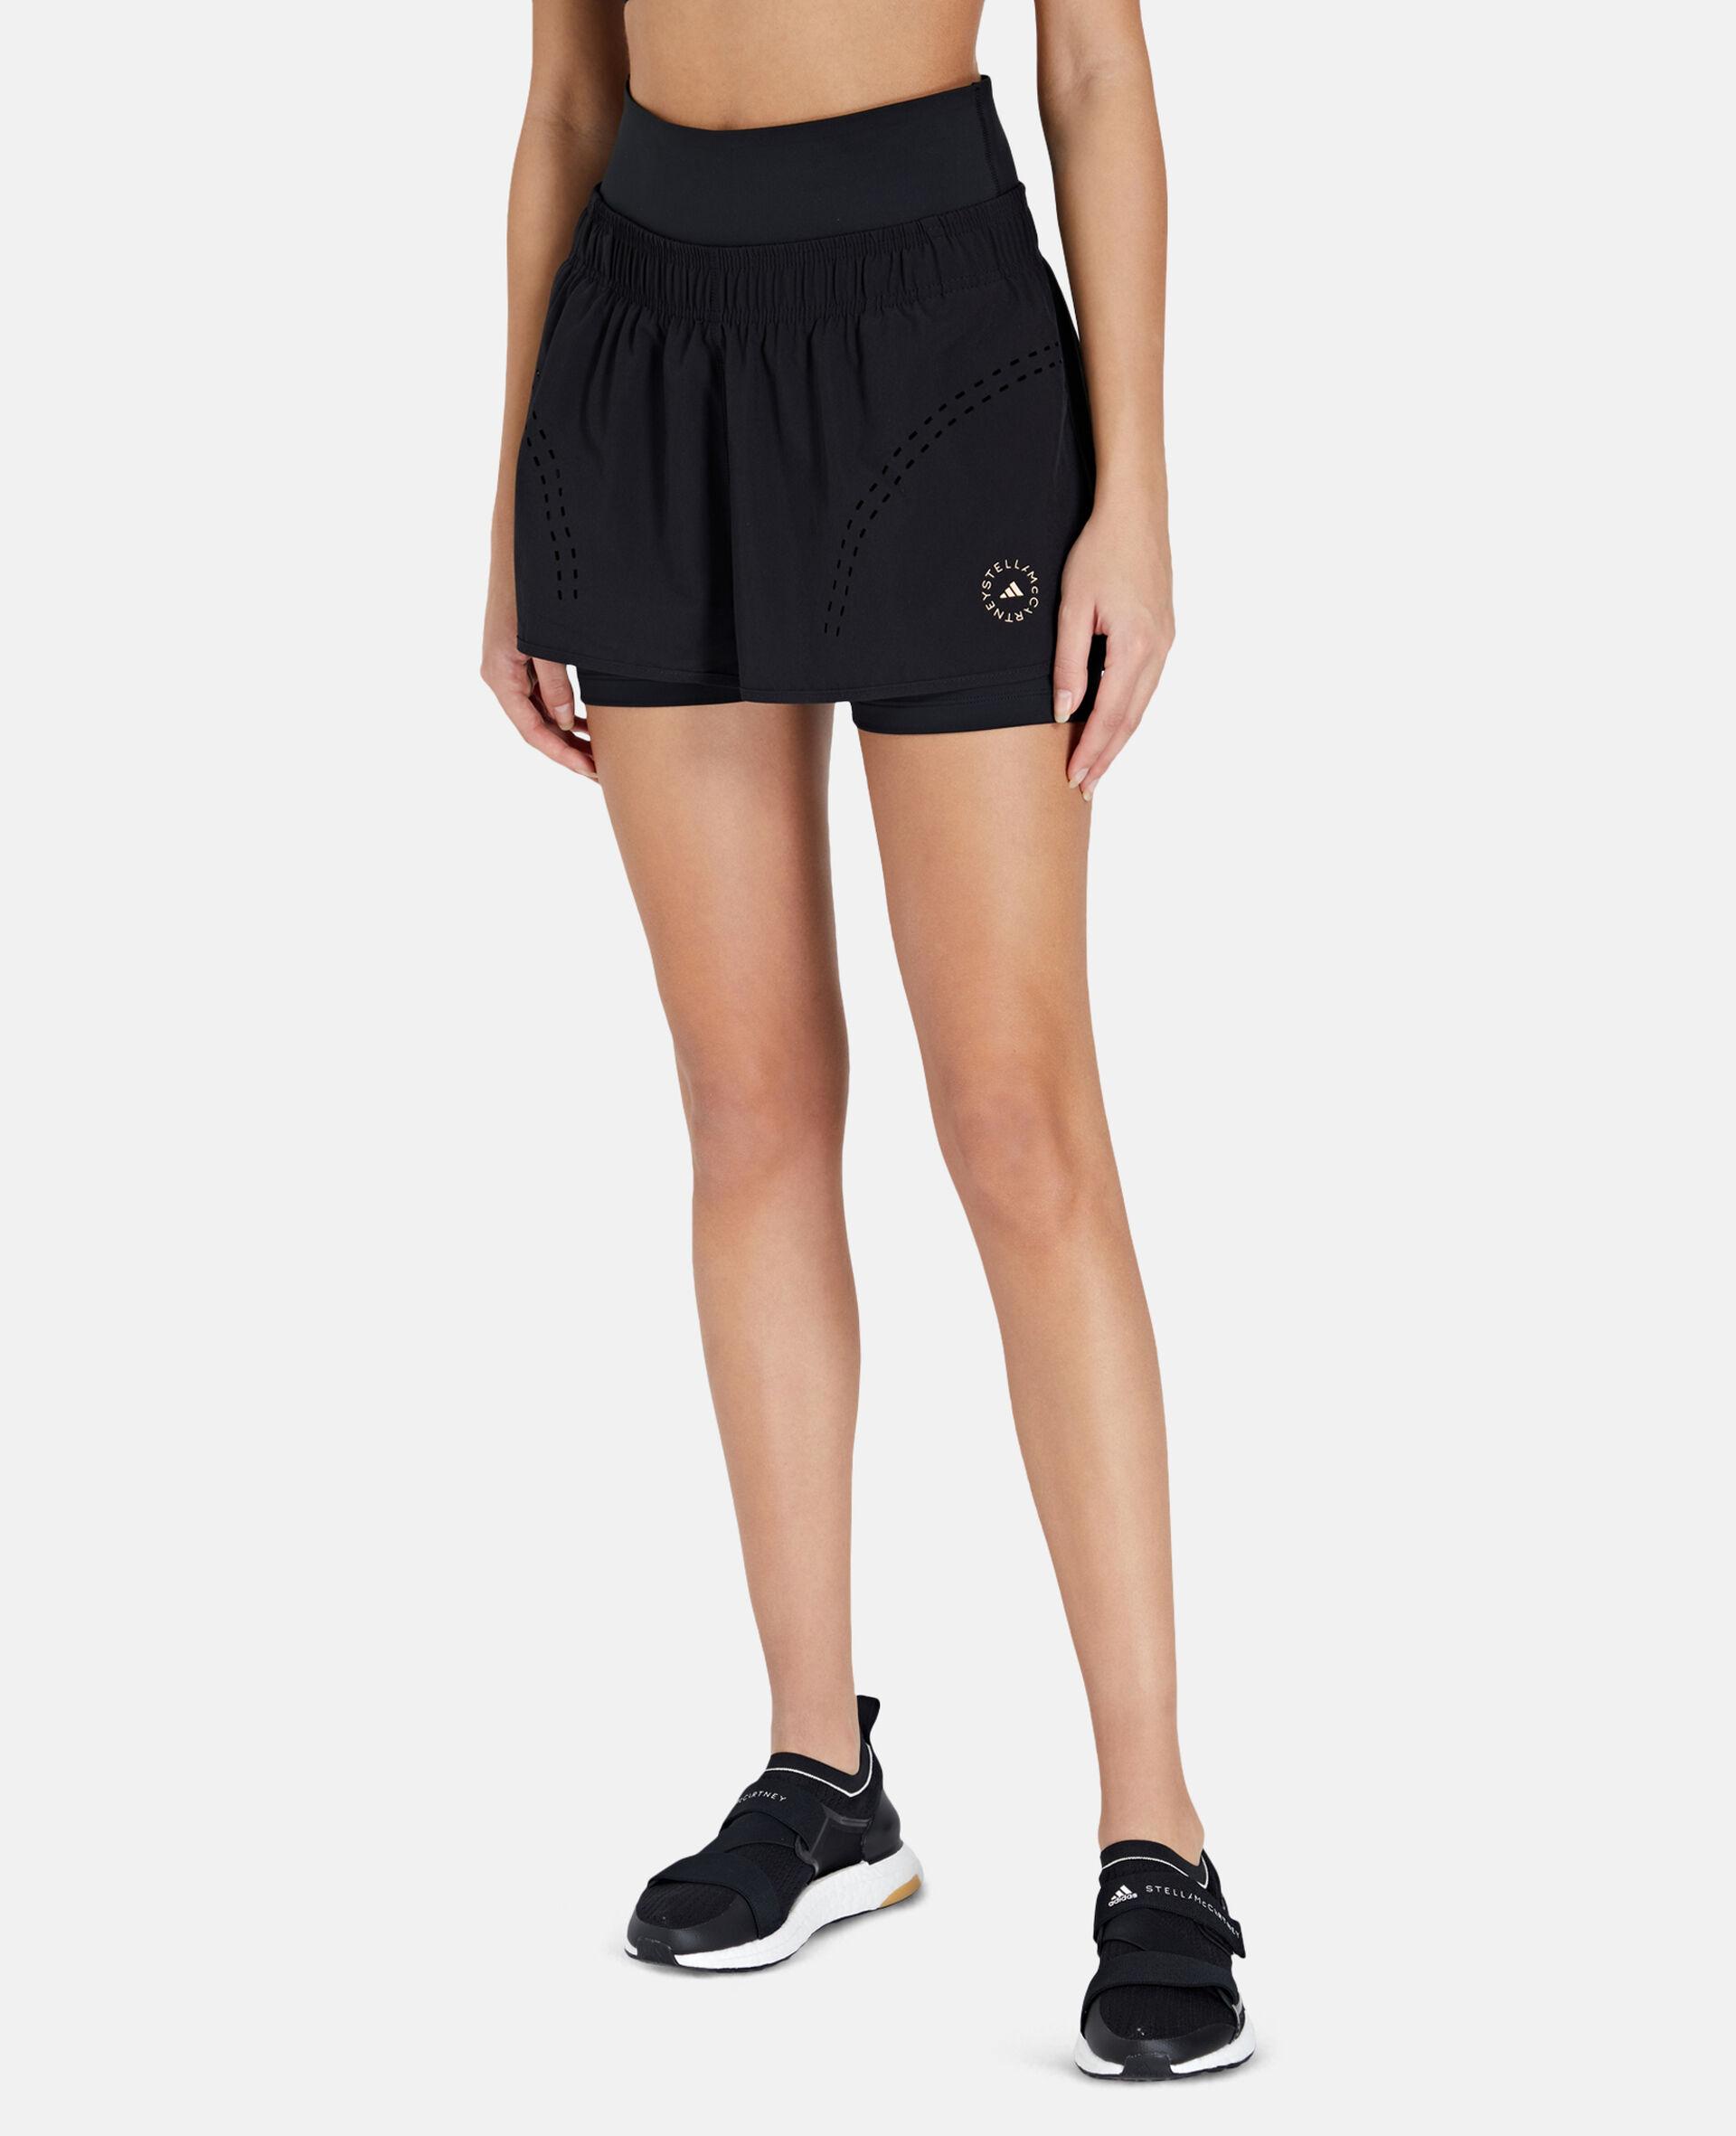 Schwarze TruePurpose Sport-Shorts-Schwarz-large image number 6